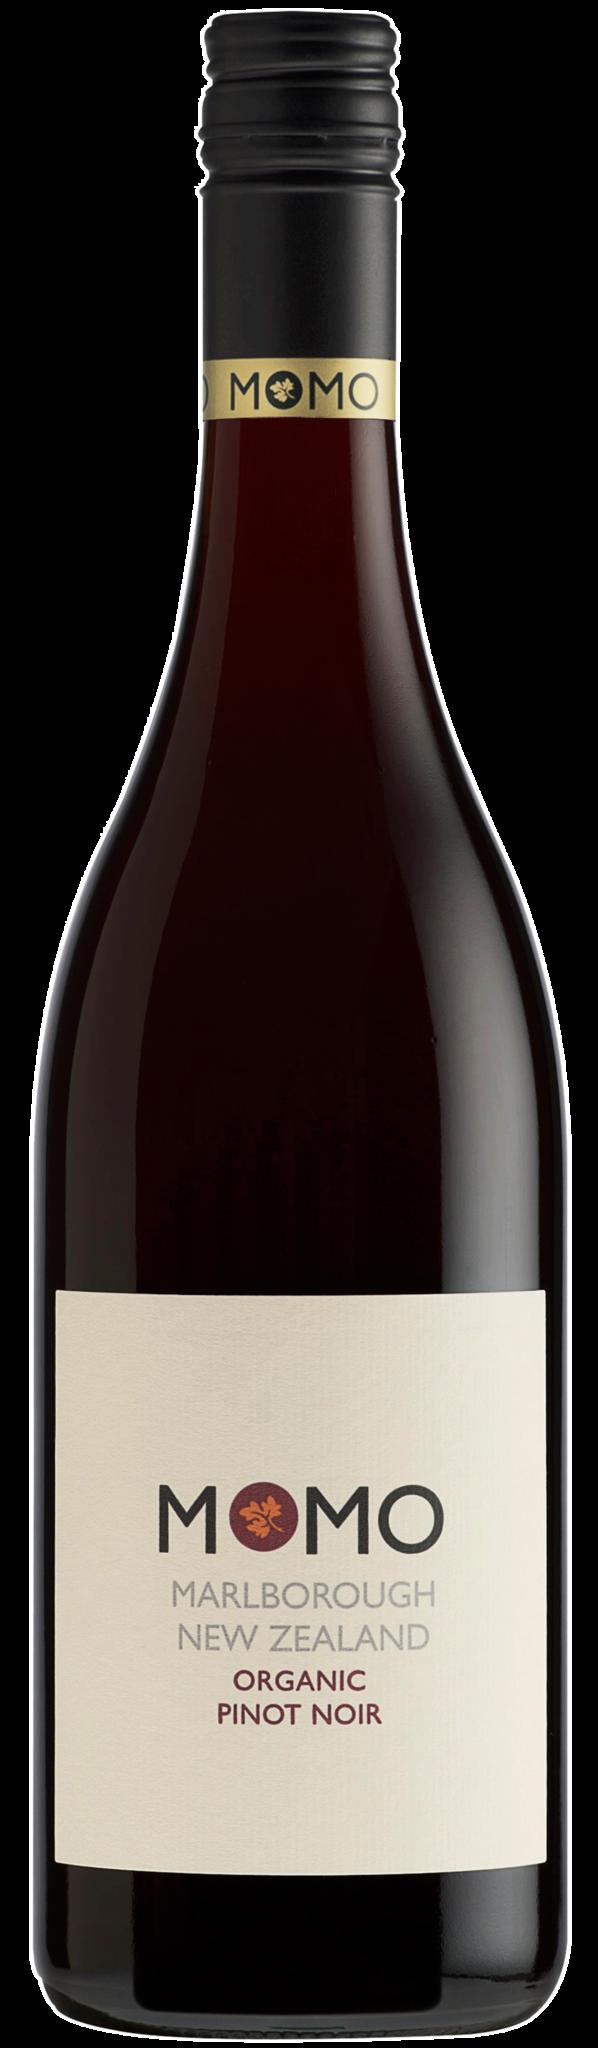 Seresin Momo Pinot Noir 2017